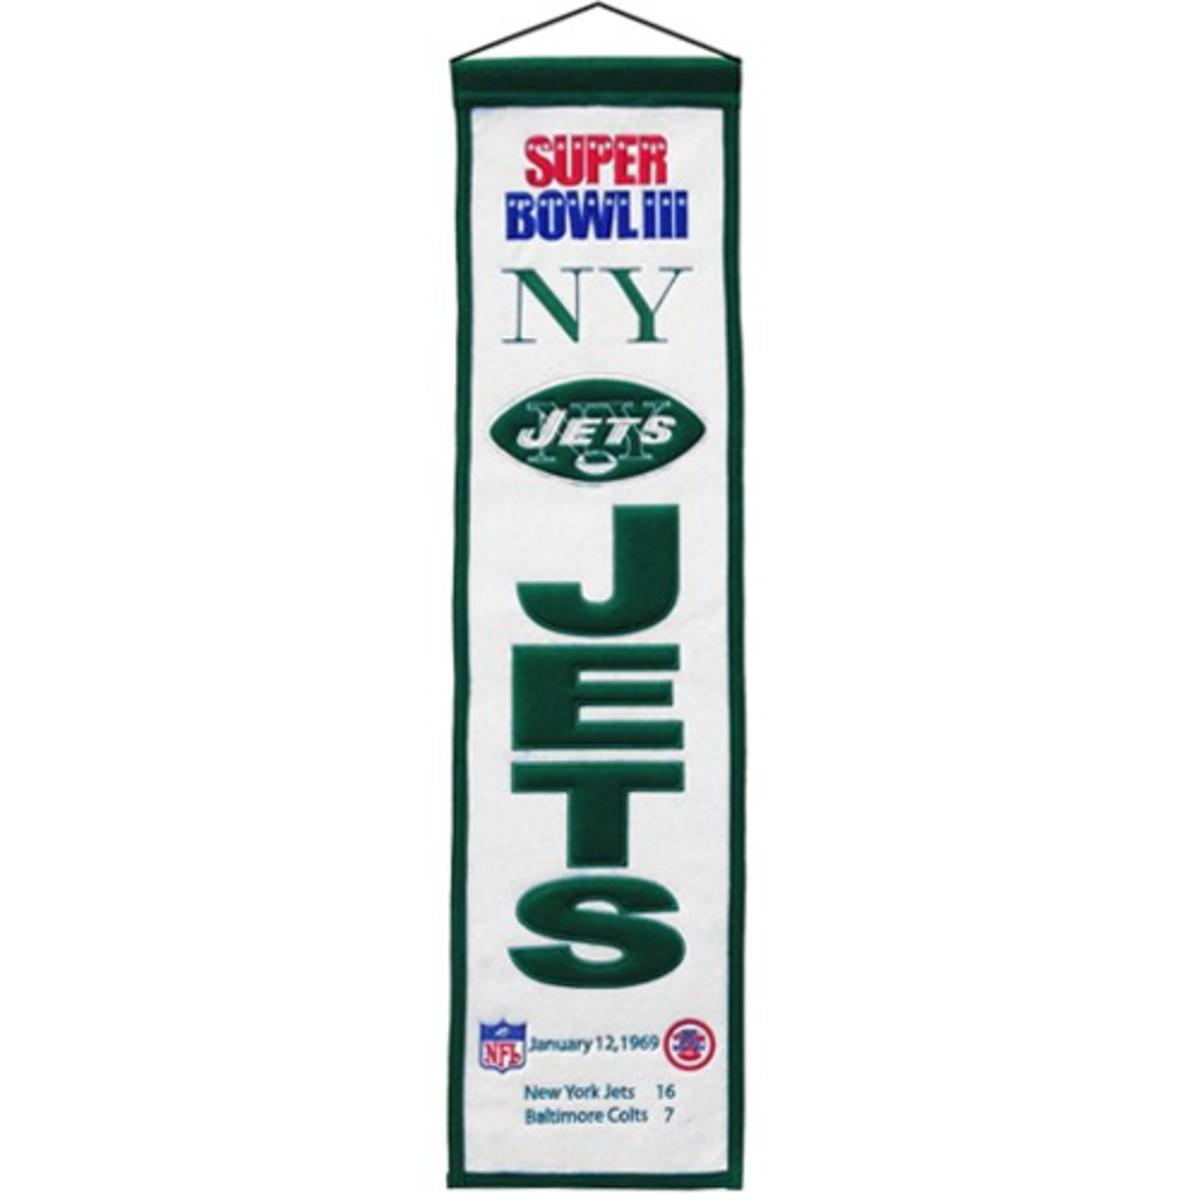 NY Jets 1969 Super Bowl III Winners